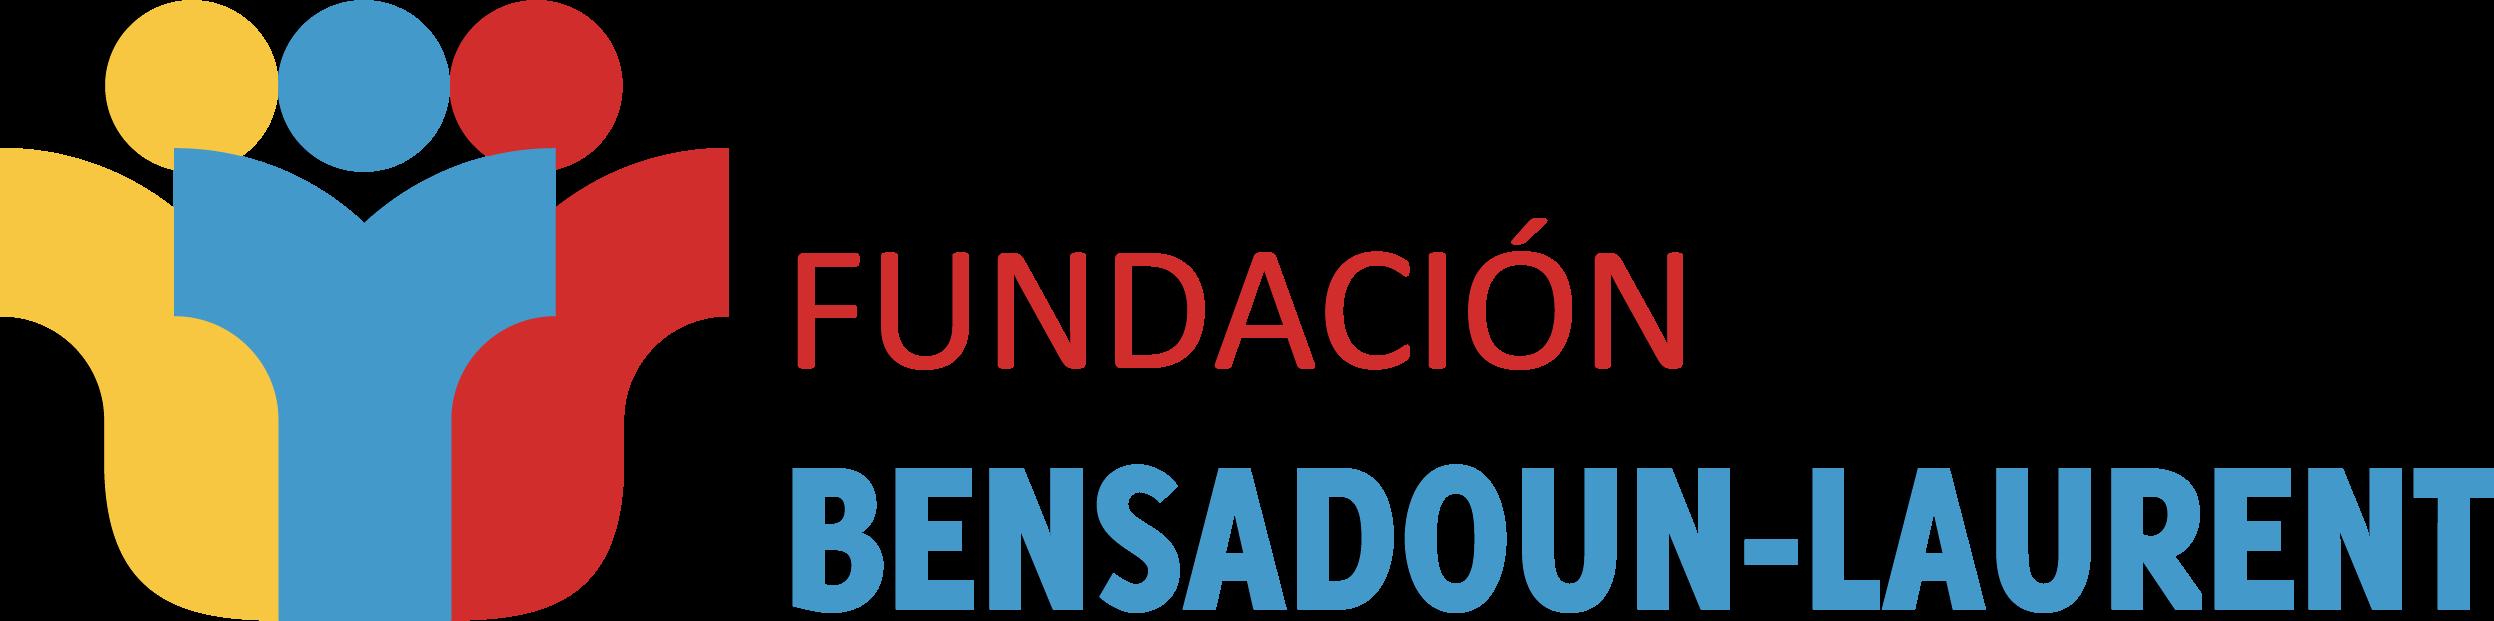 Fundación Bensadoun Laurent